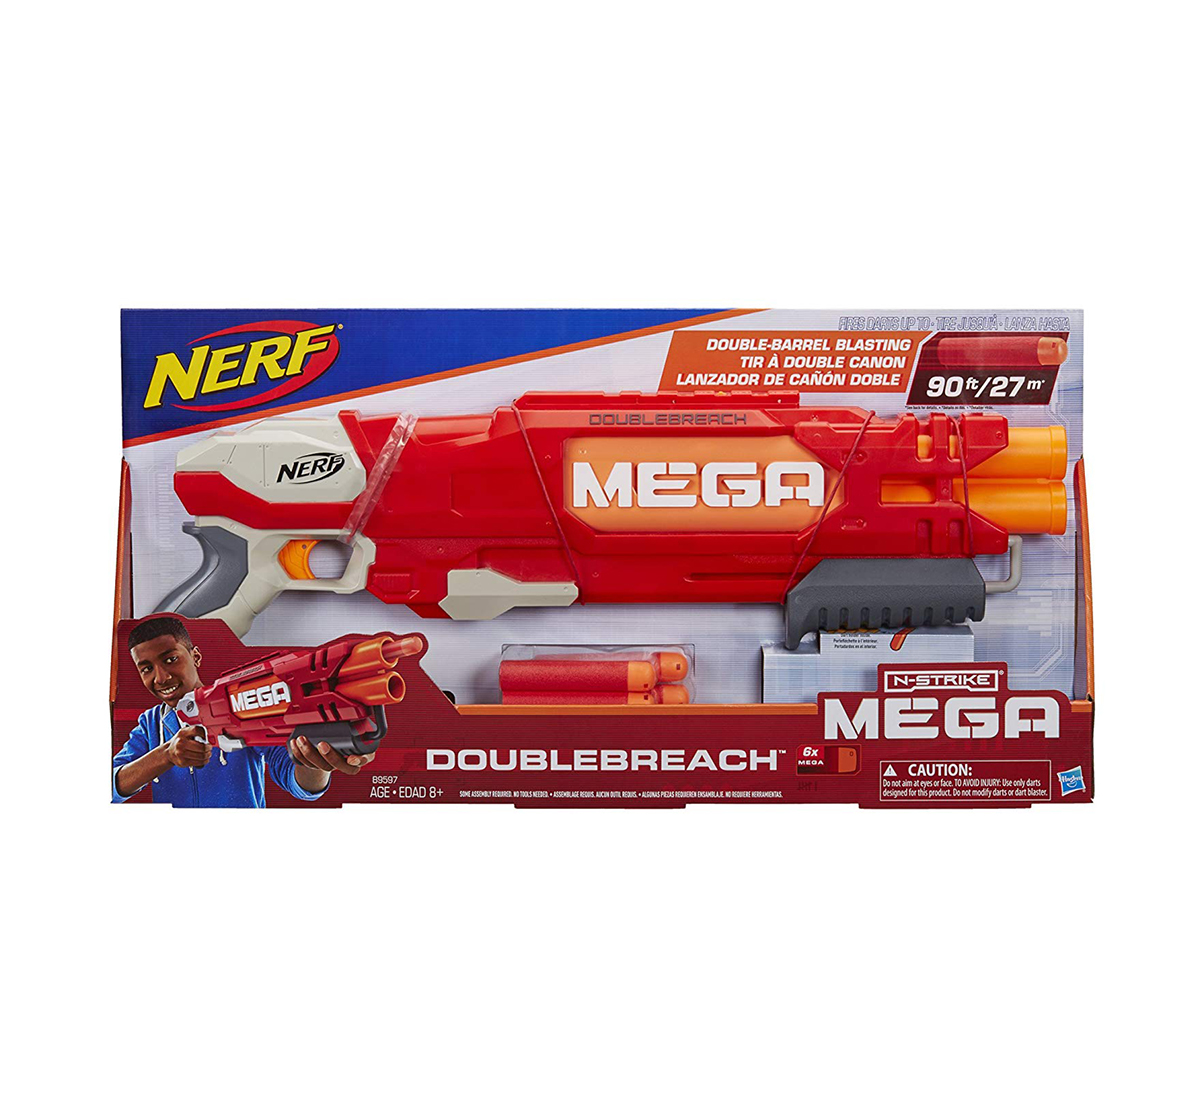 Nerf | Nerf Mega Doublebreach Blaster -- Breech Load, Pump Action -- age 6Y+